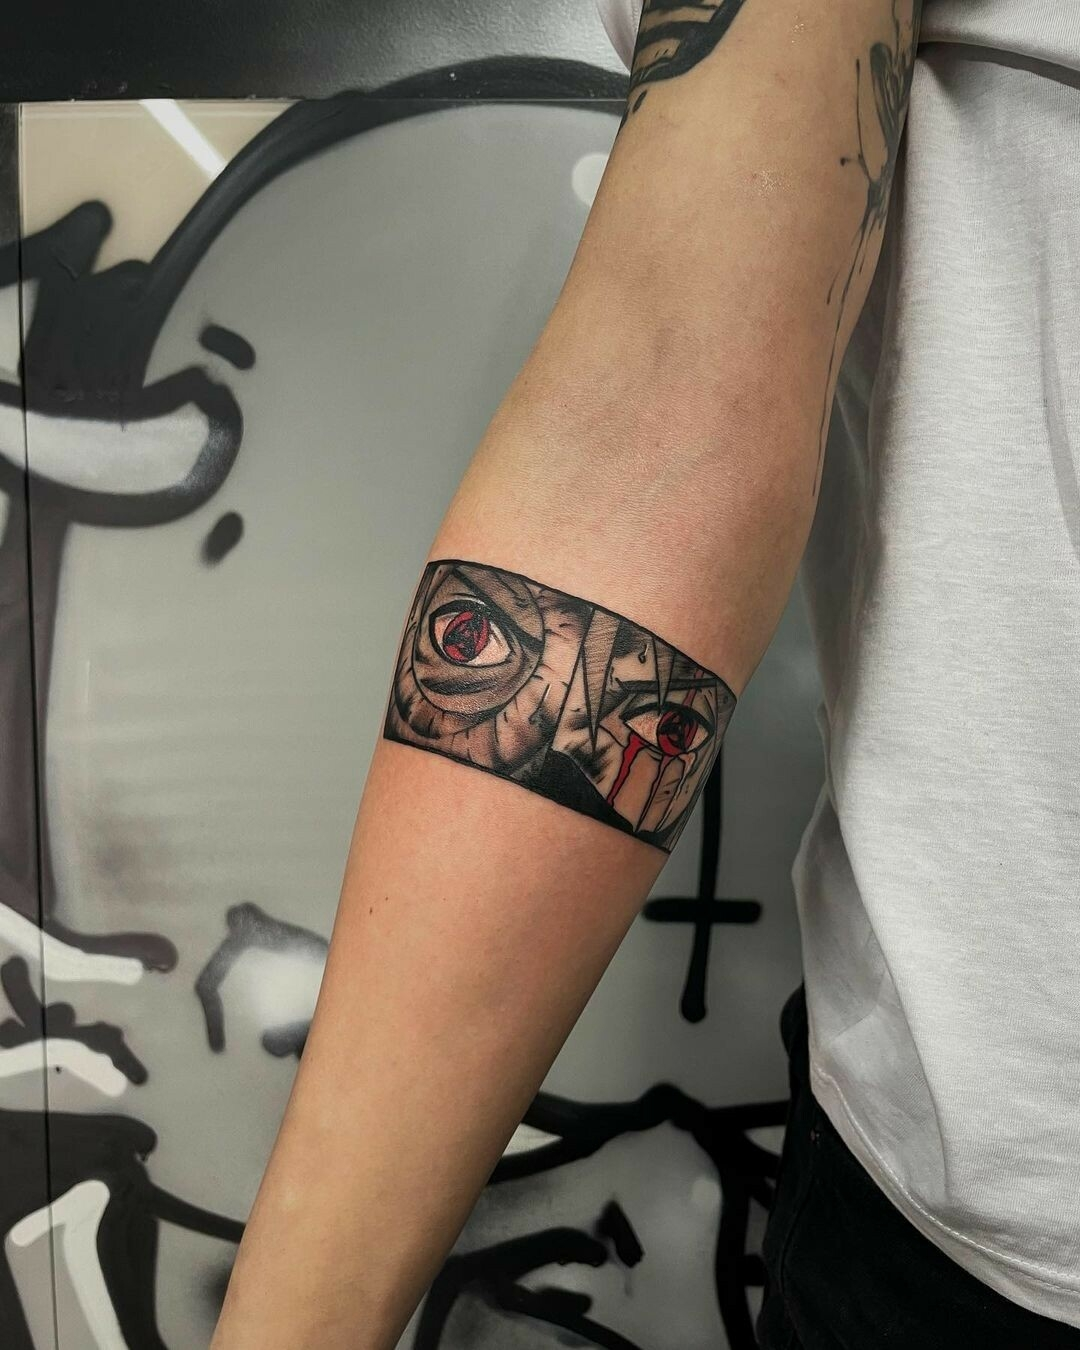 Inksearch tattoo Gloson